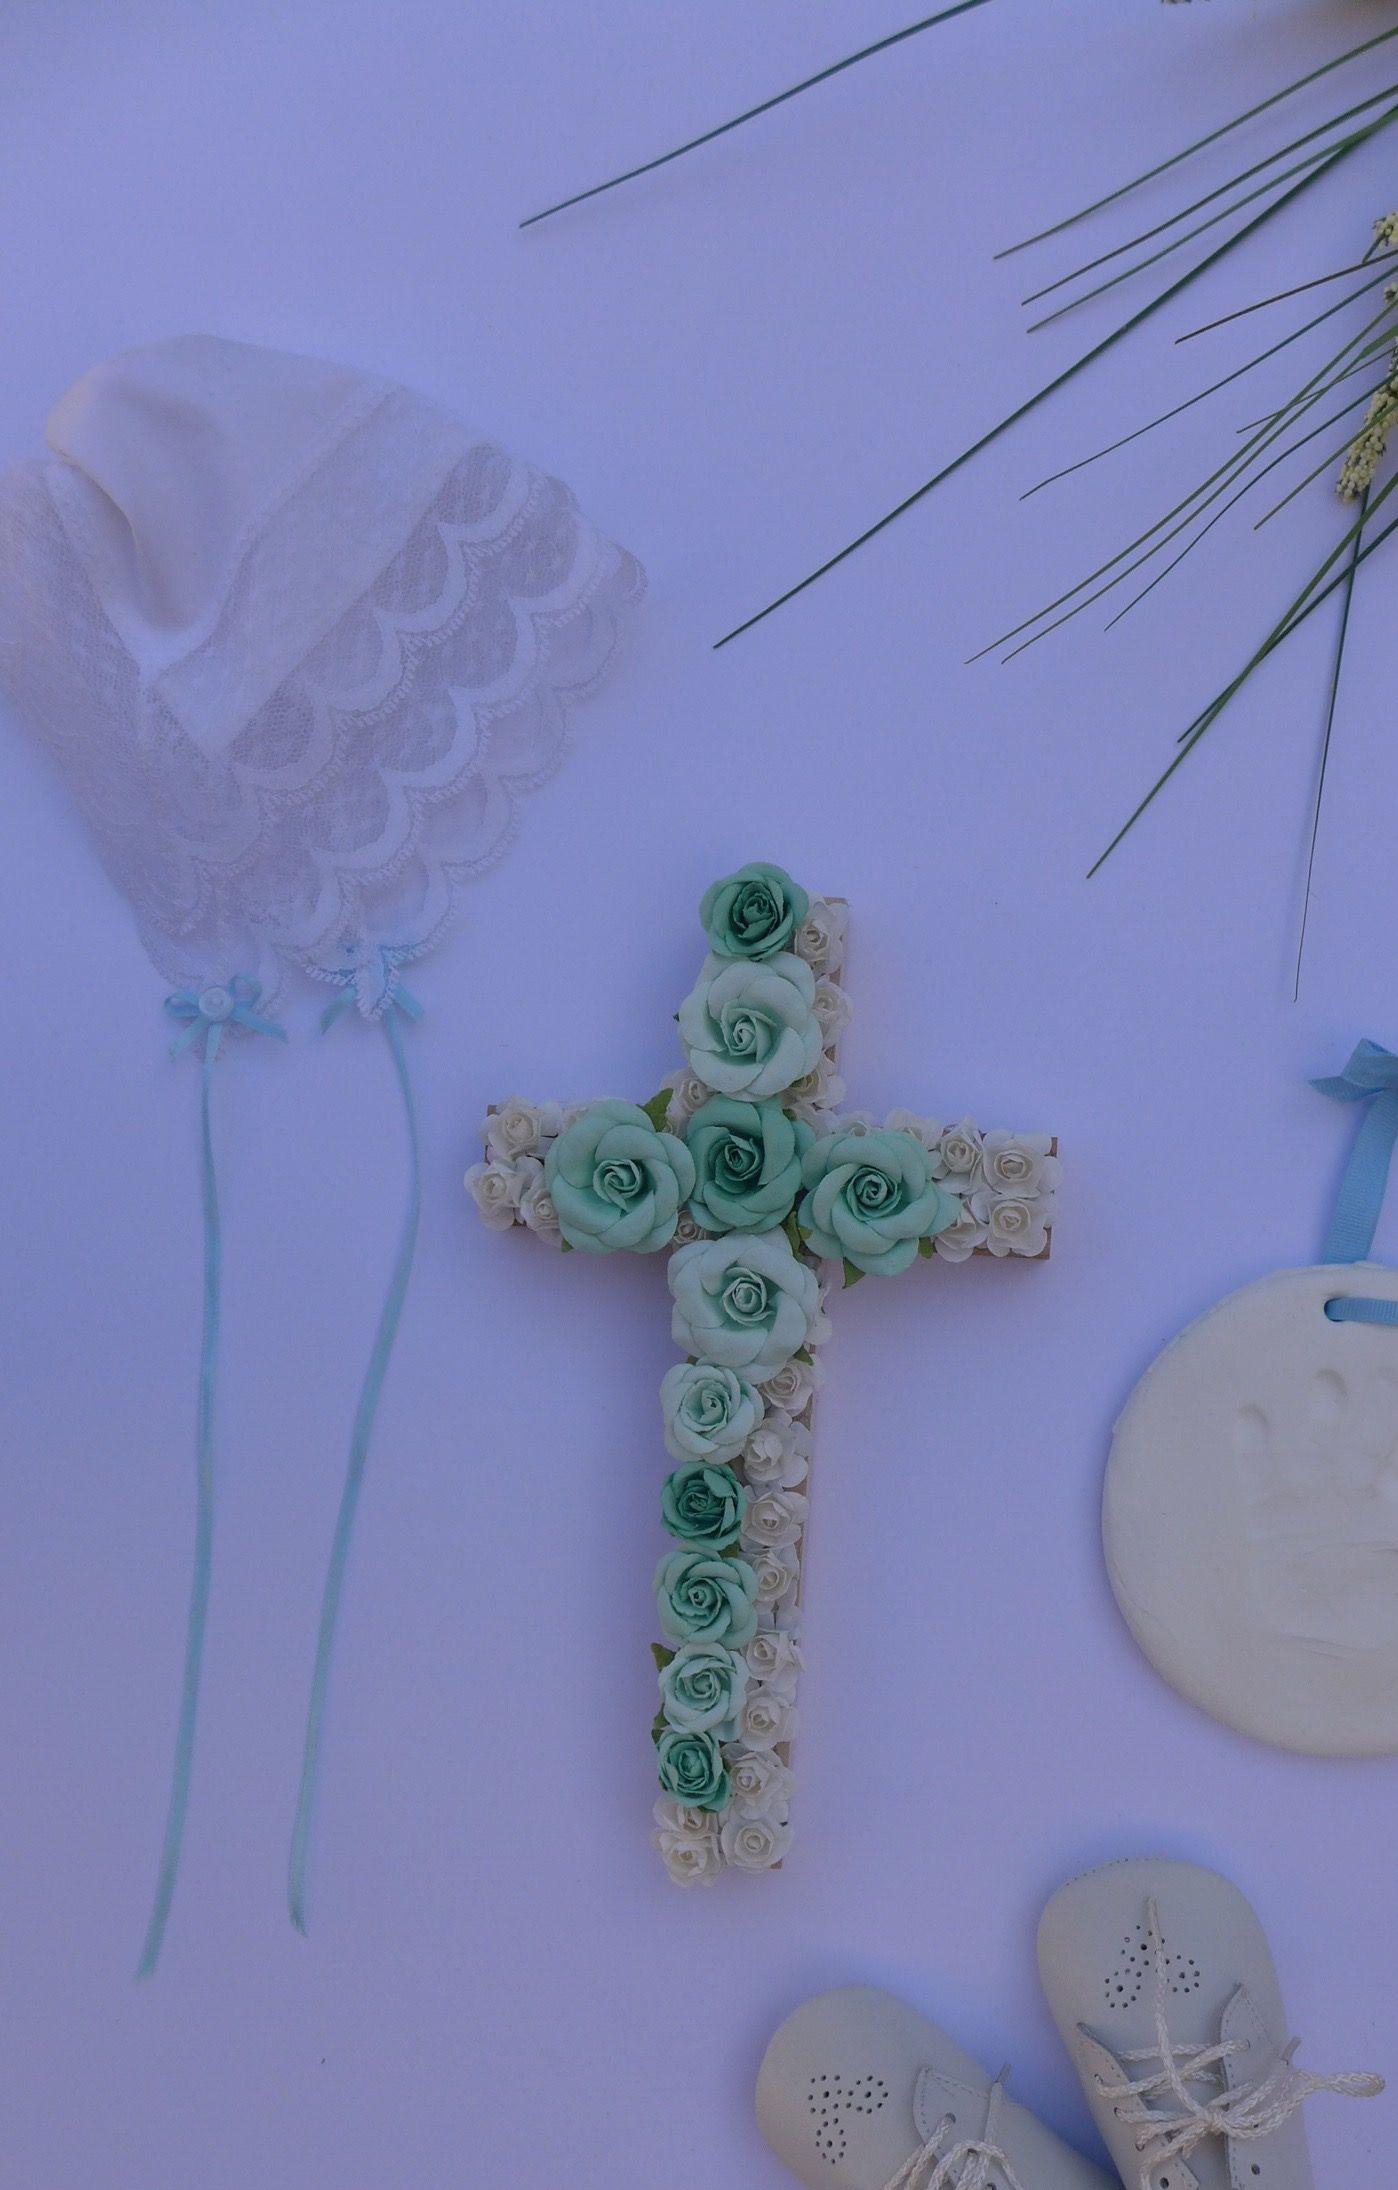 christening gift ideas boy/ christening boy/ christening present boy